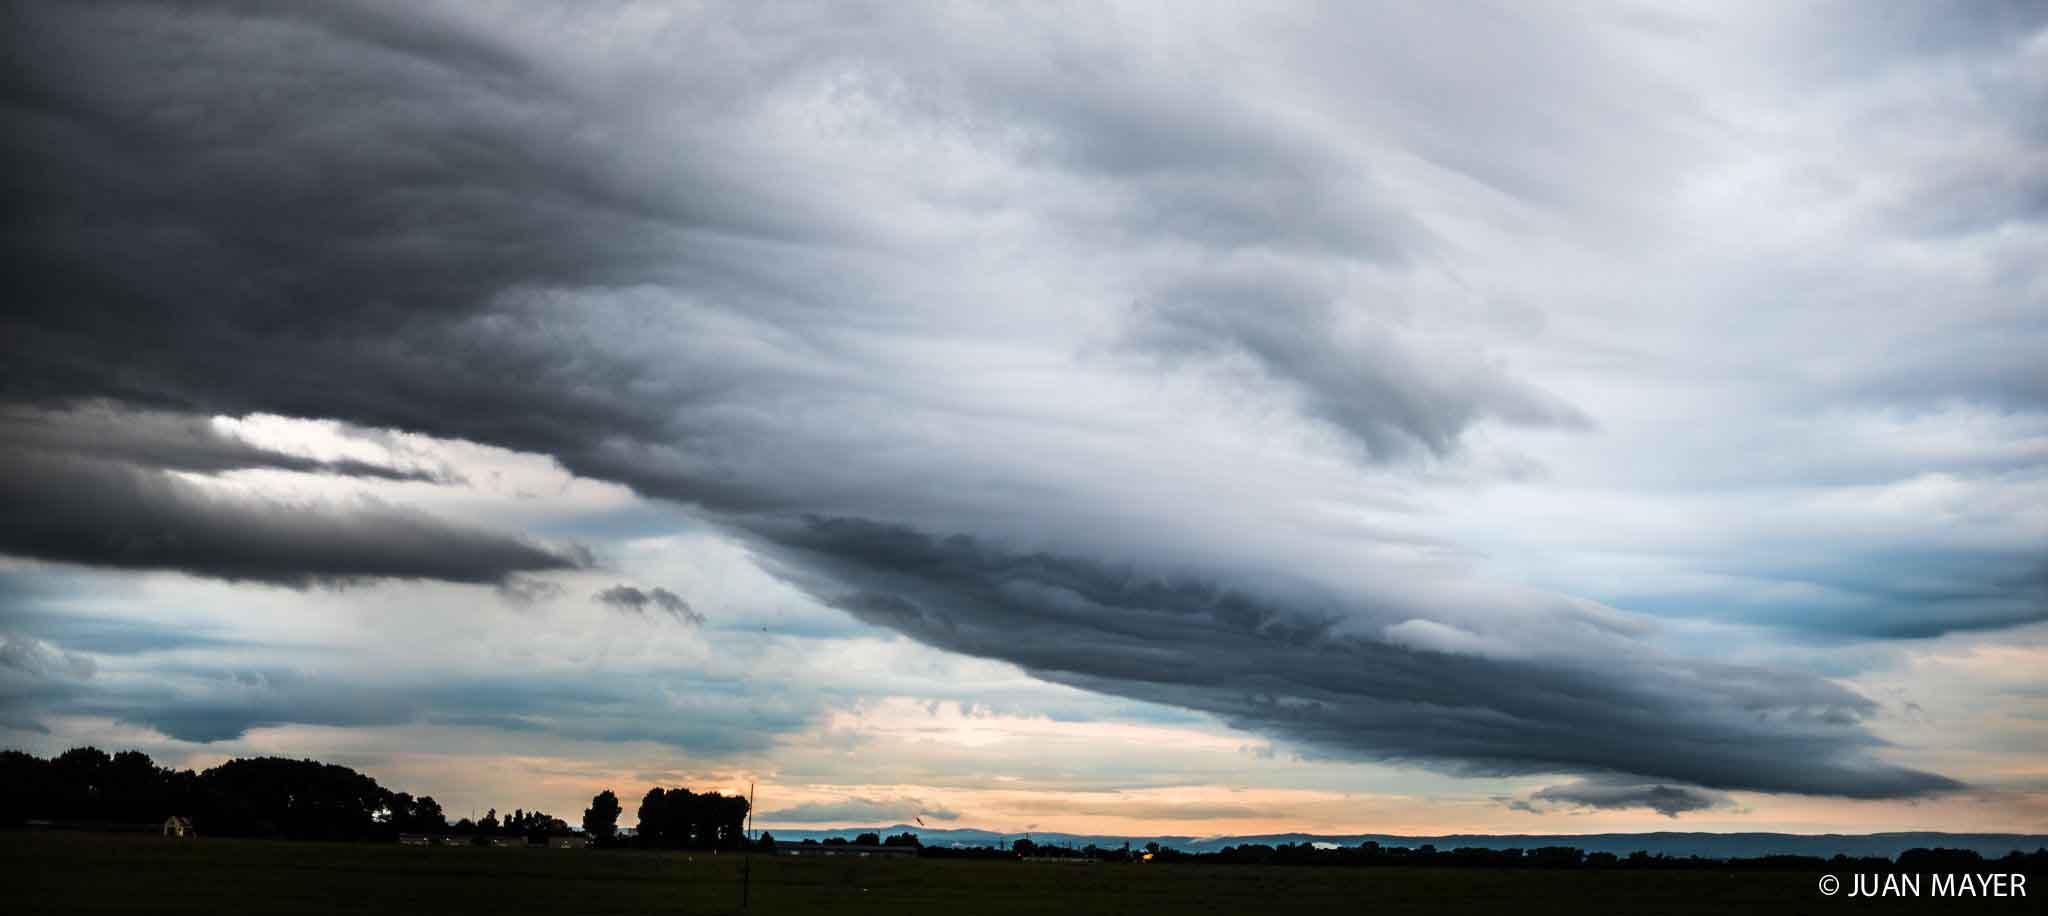 Cloudy skies over Prostejov